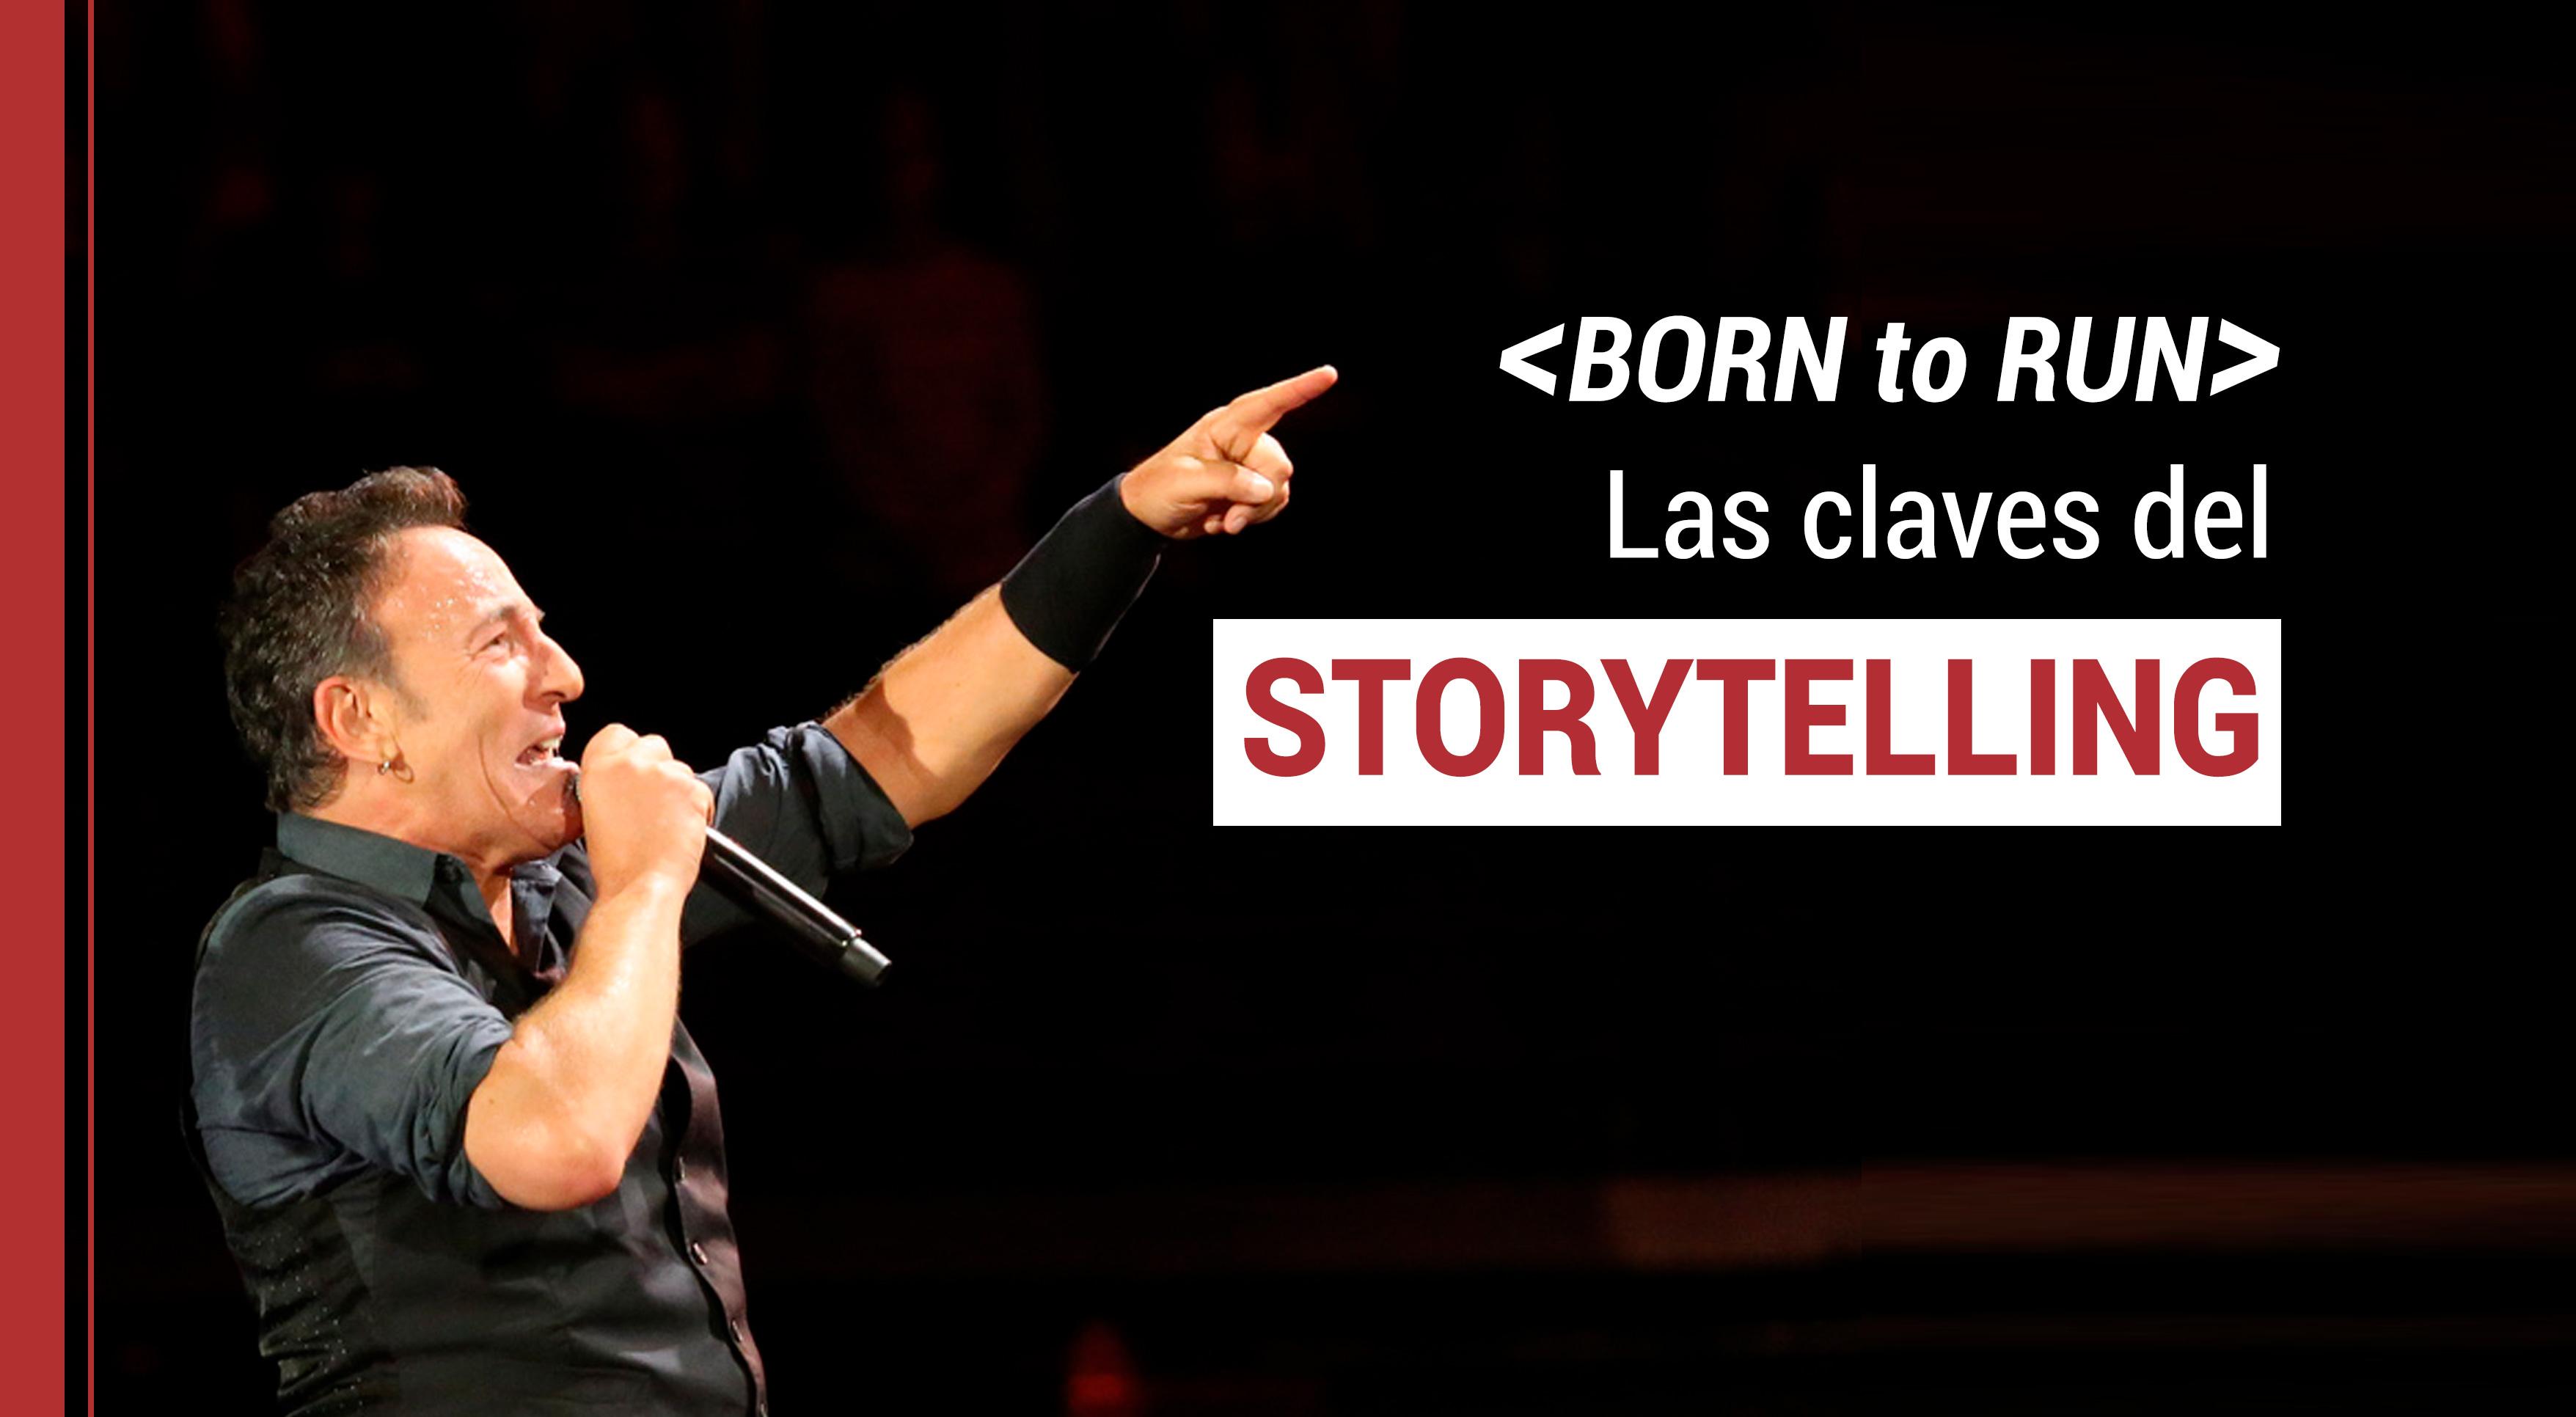 las 7 claves del storytelling